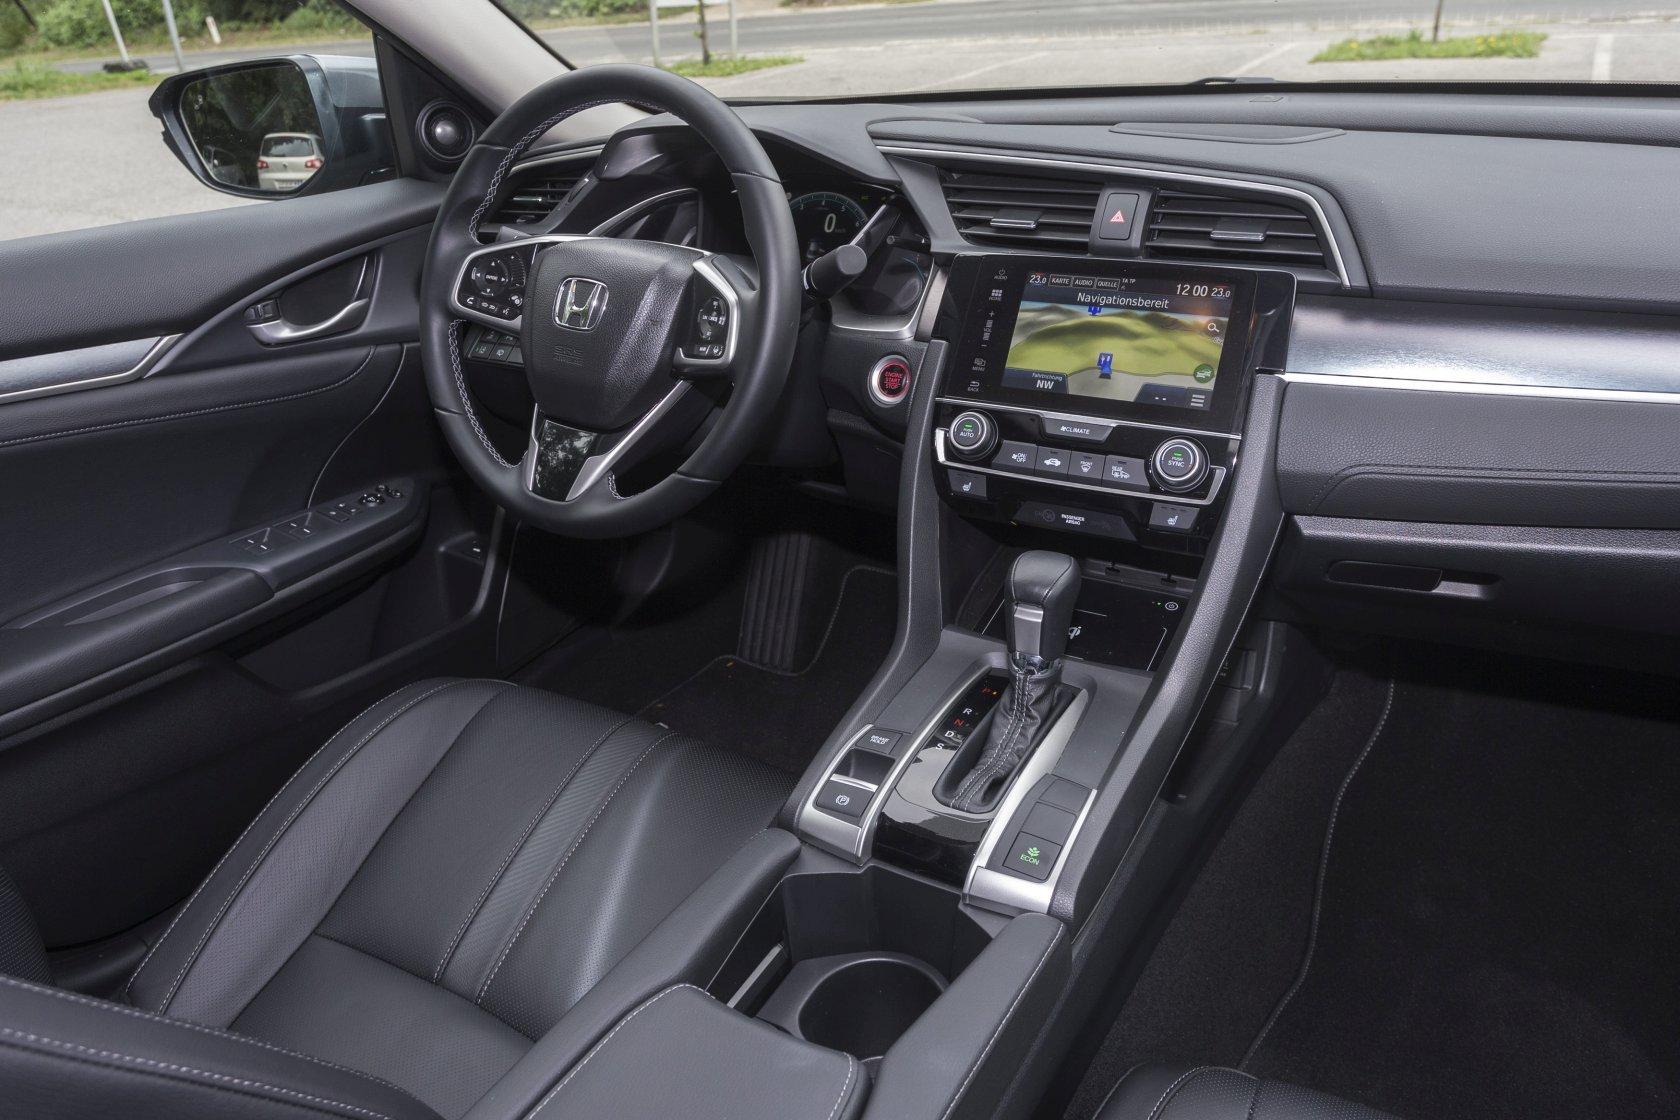 Test Honda Civic 4d 15 Vtec Turbo Cvt Executive Alles Auto